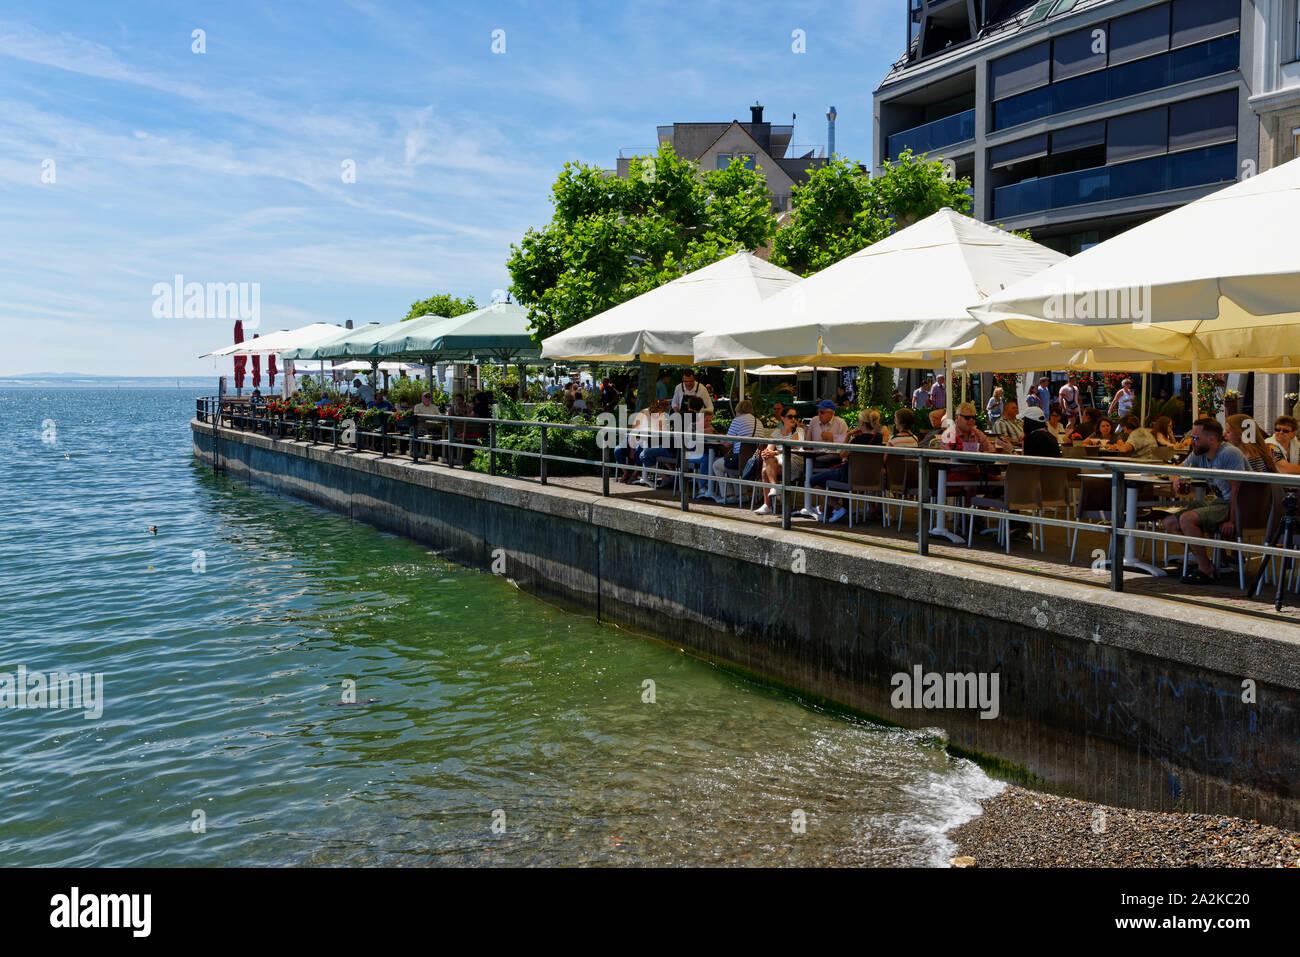 Lakeside promenade in Friedrichshafen on Lake Constance, Baden-Württemberg, Germany Stock Photo